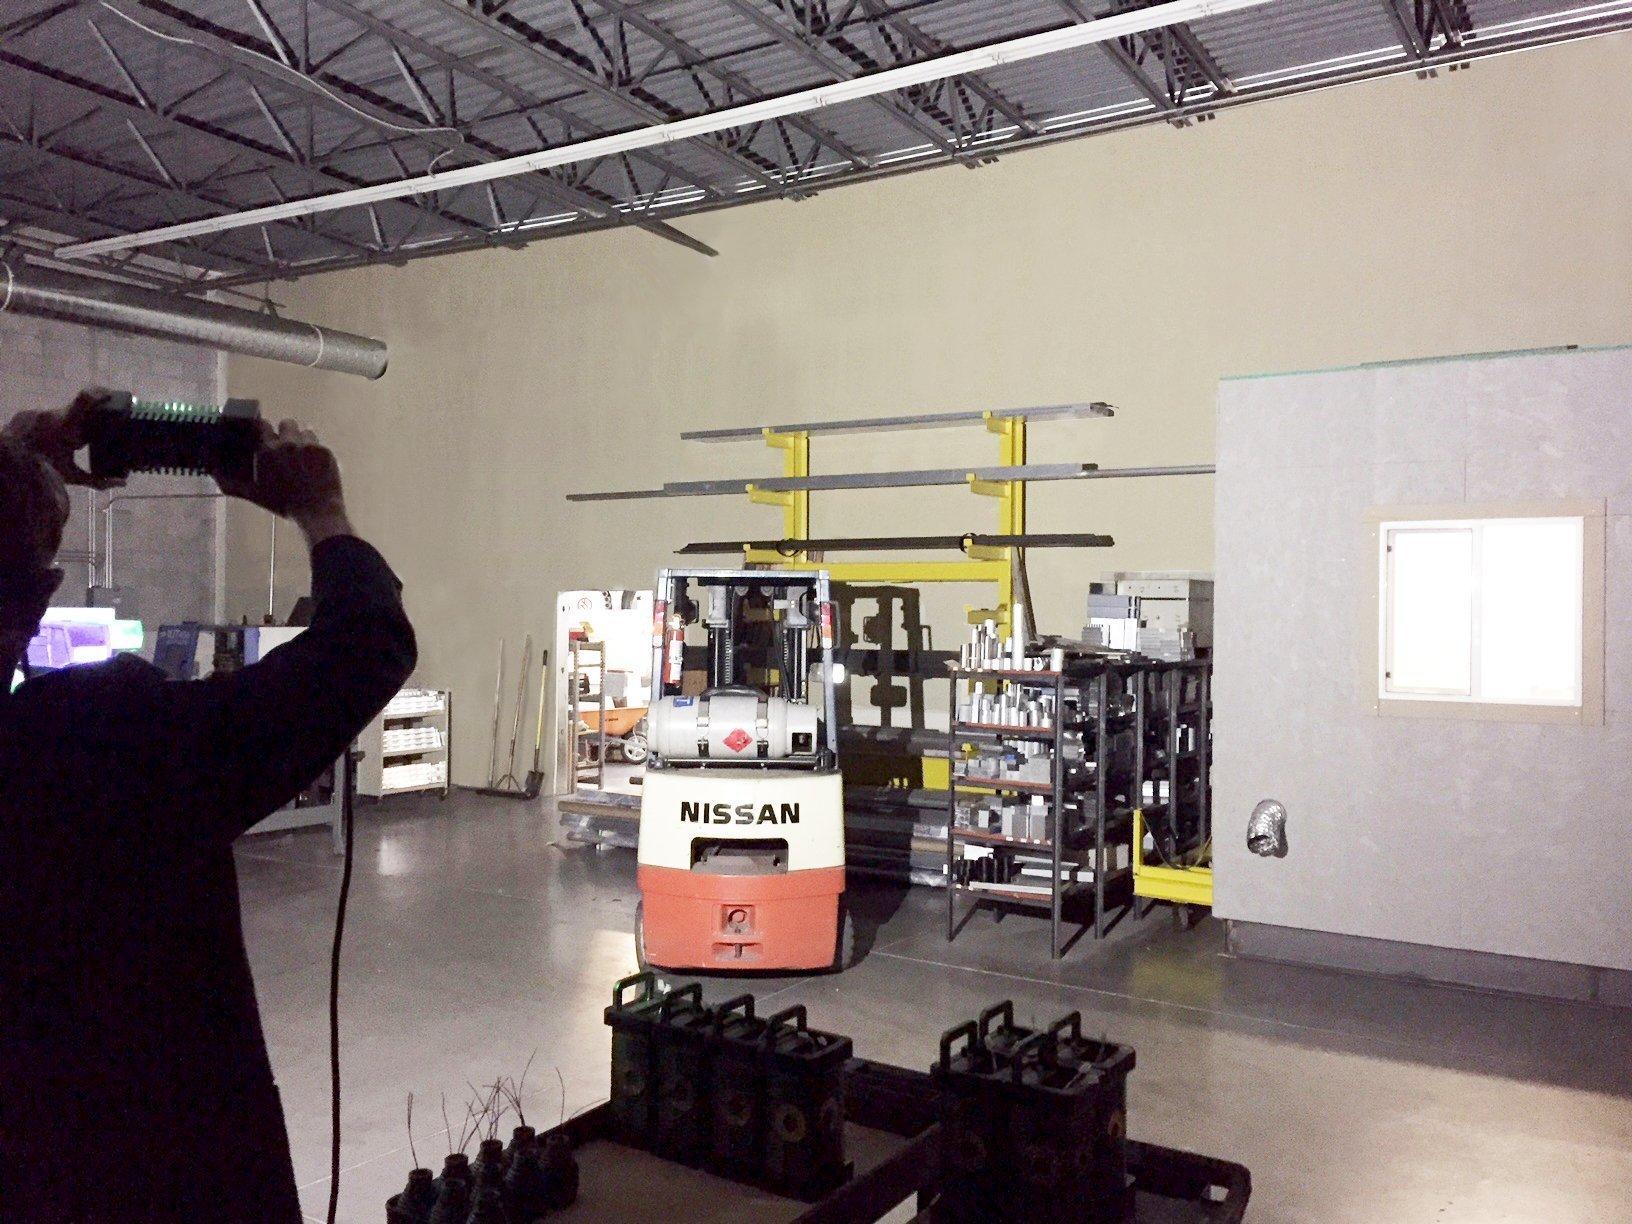 LINKaLIGHT, link a light, led stringer light system, led, portable, work light, ordinary location, temporary job site light, string work light, floodlight, area light, 4400, led wide area stringer light system